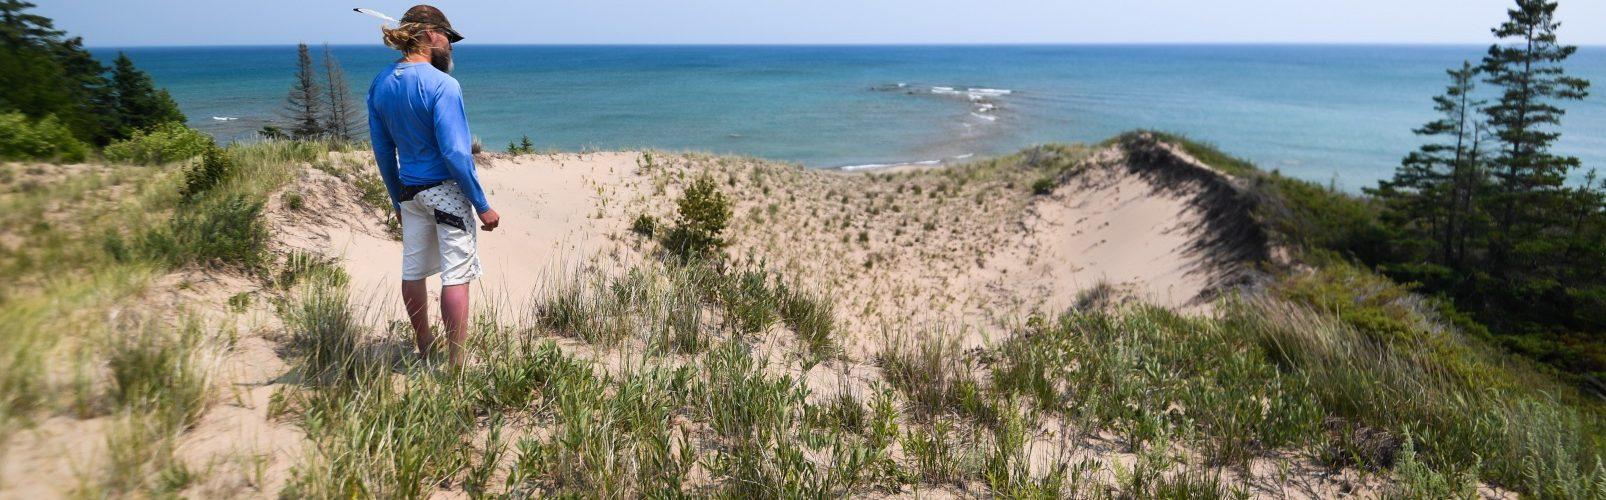 Great-Lakes-sand-dunes-water-Scott_Parent-photo